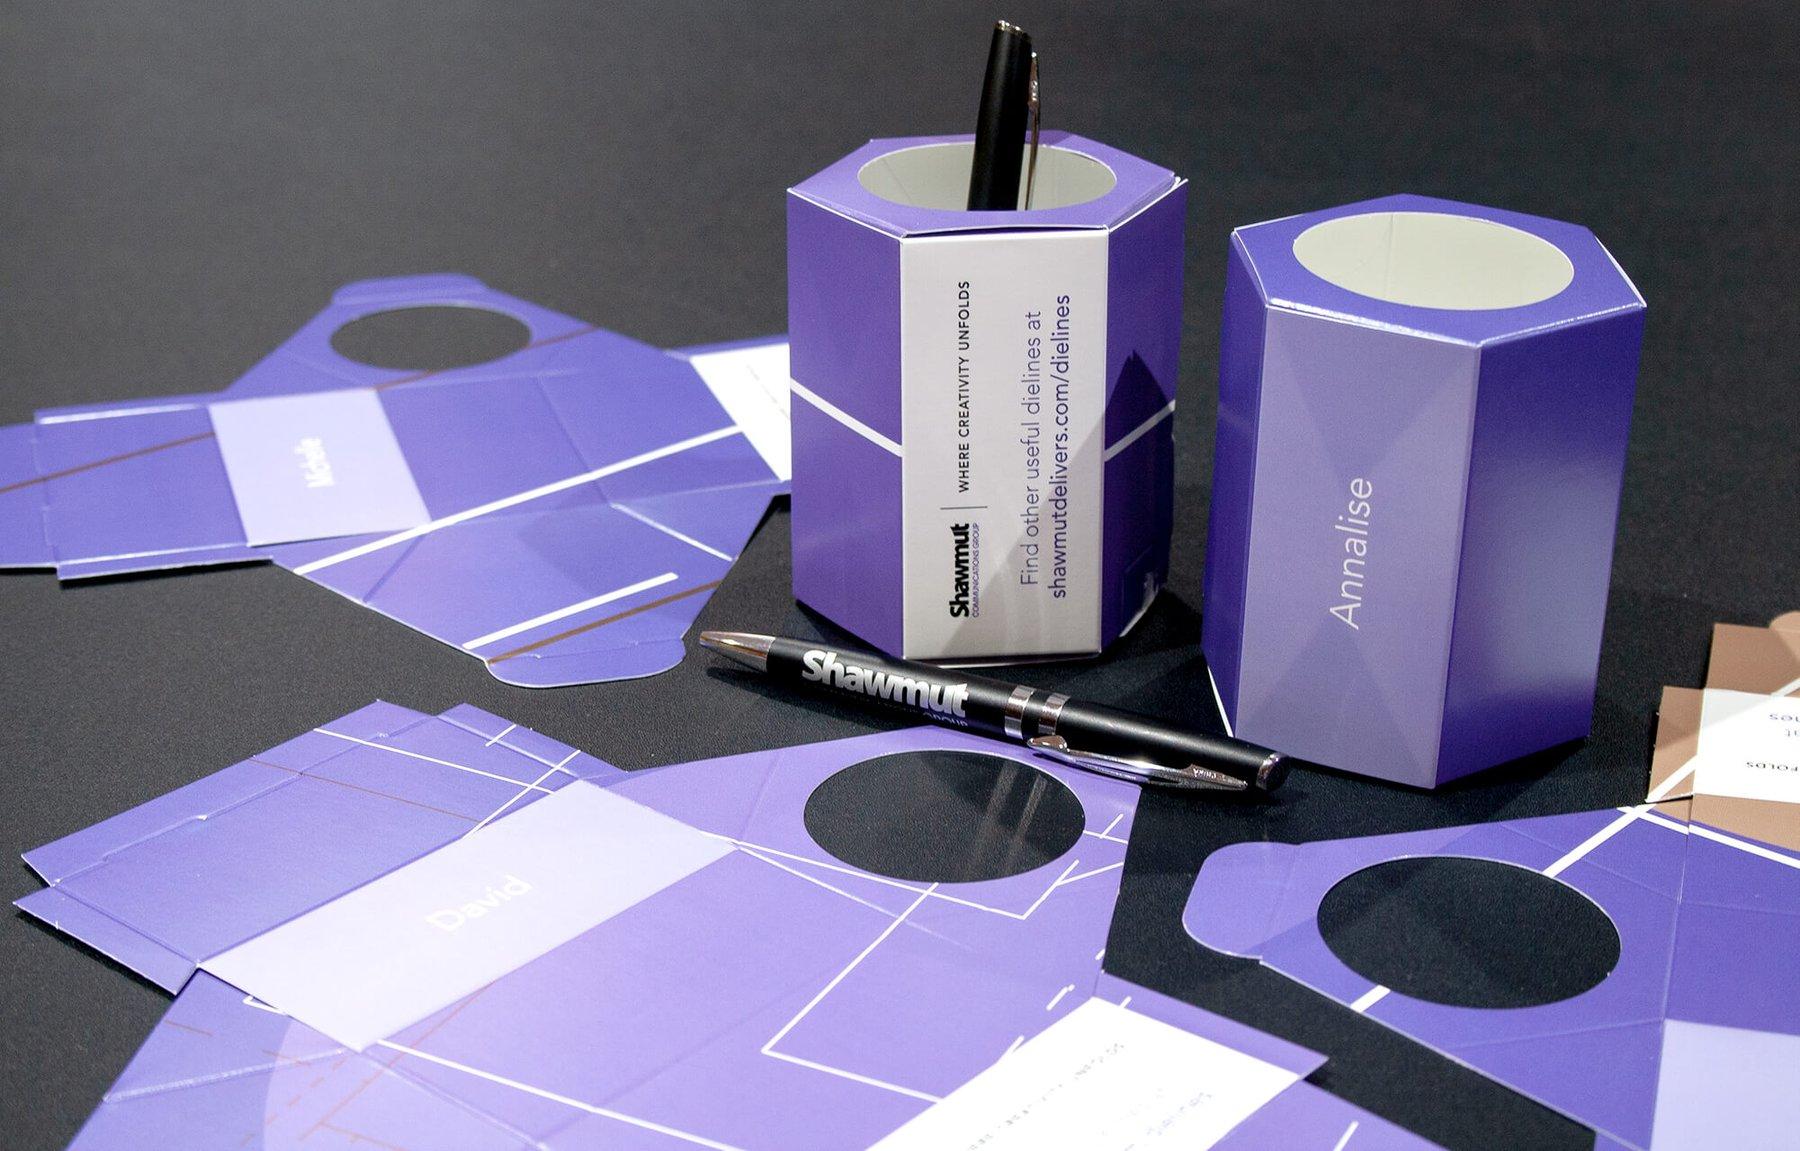 Shawmut personalized die-cut pencil cup